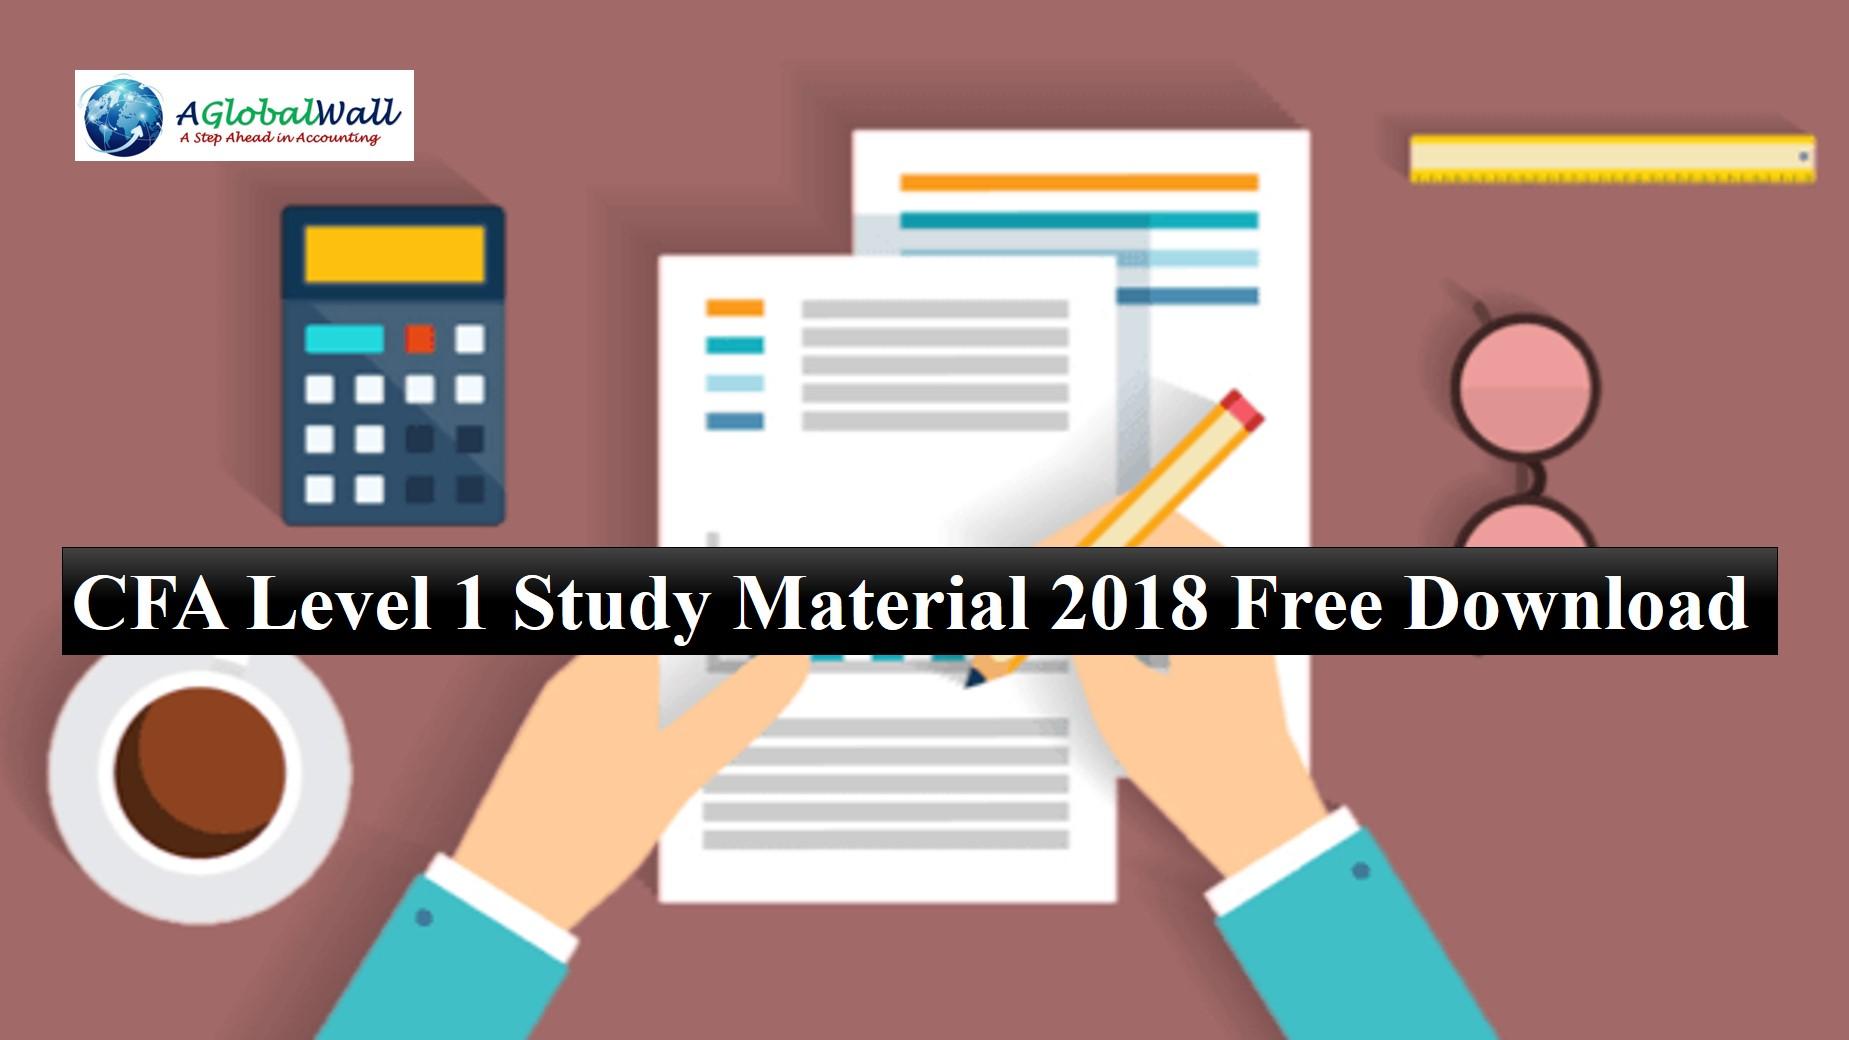 JMET TEST PAPERS PDF - e85systems.com